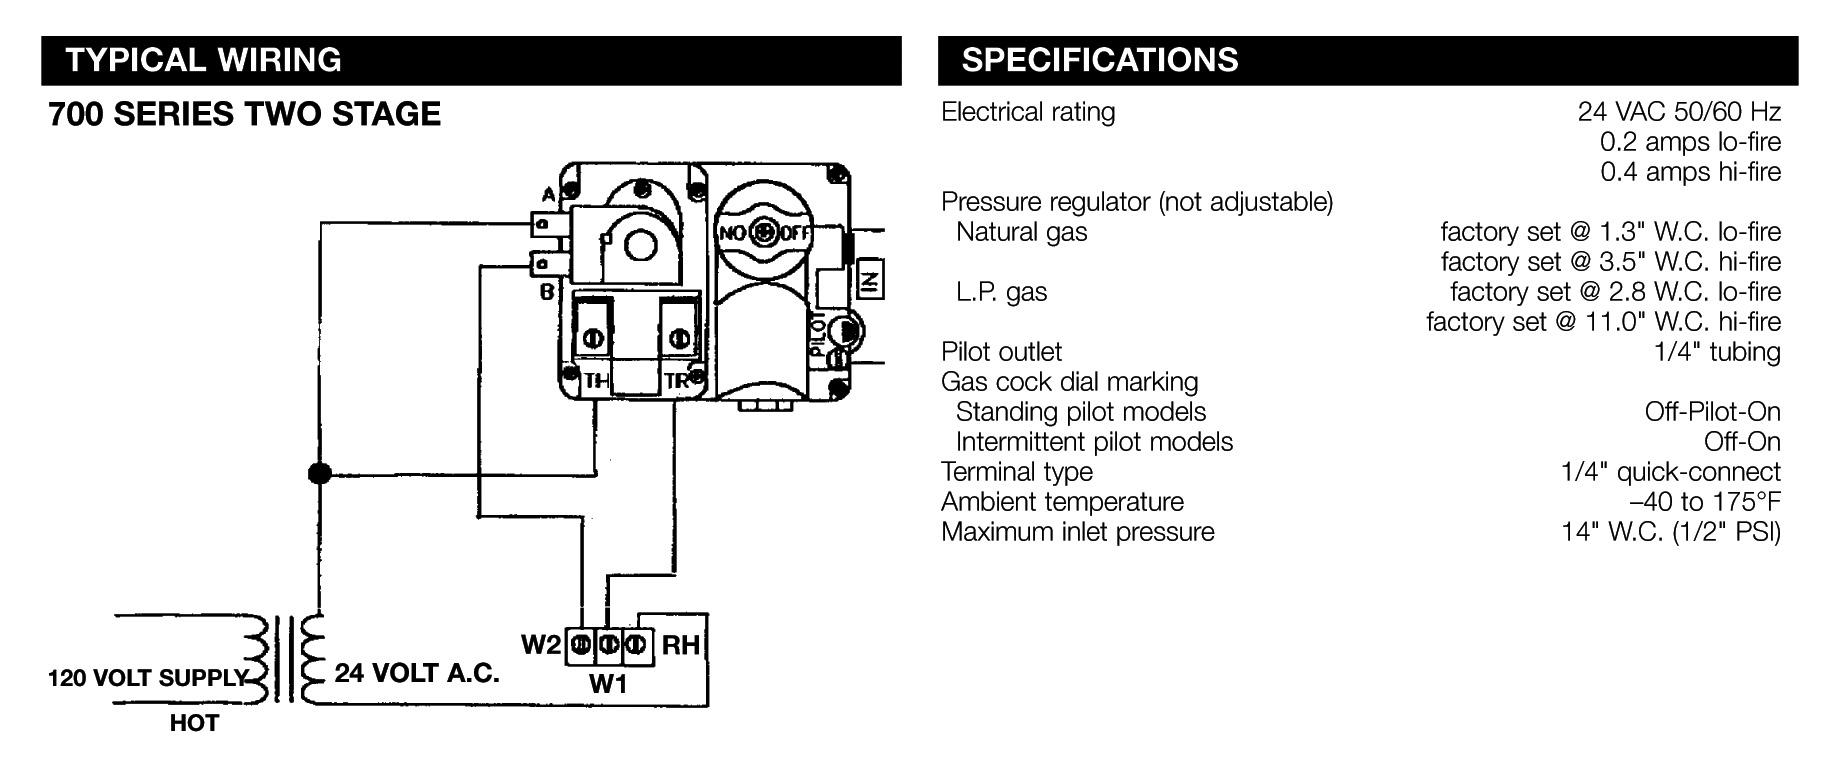 Wire Diagram F 14 Custom Wiring Yanmar Robertshaw Gas Valve Explained Diagrams Rh Dmdelectro Co Schematic